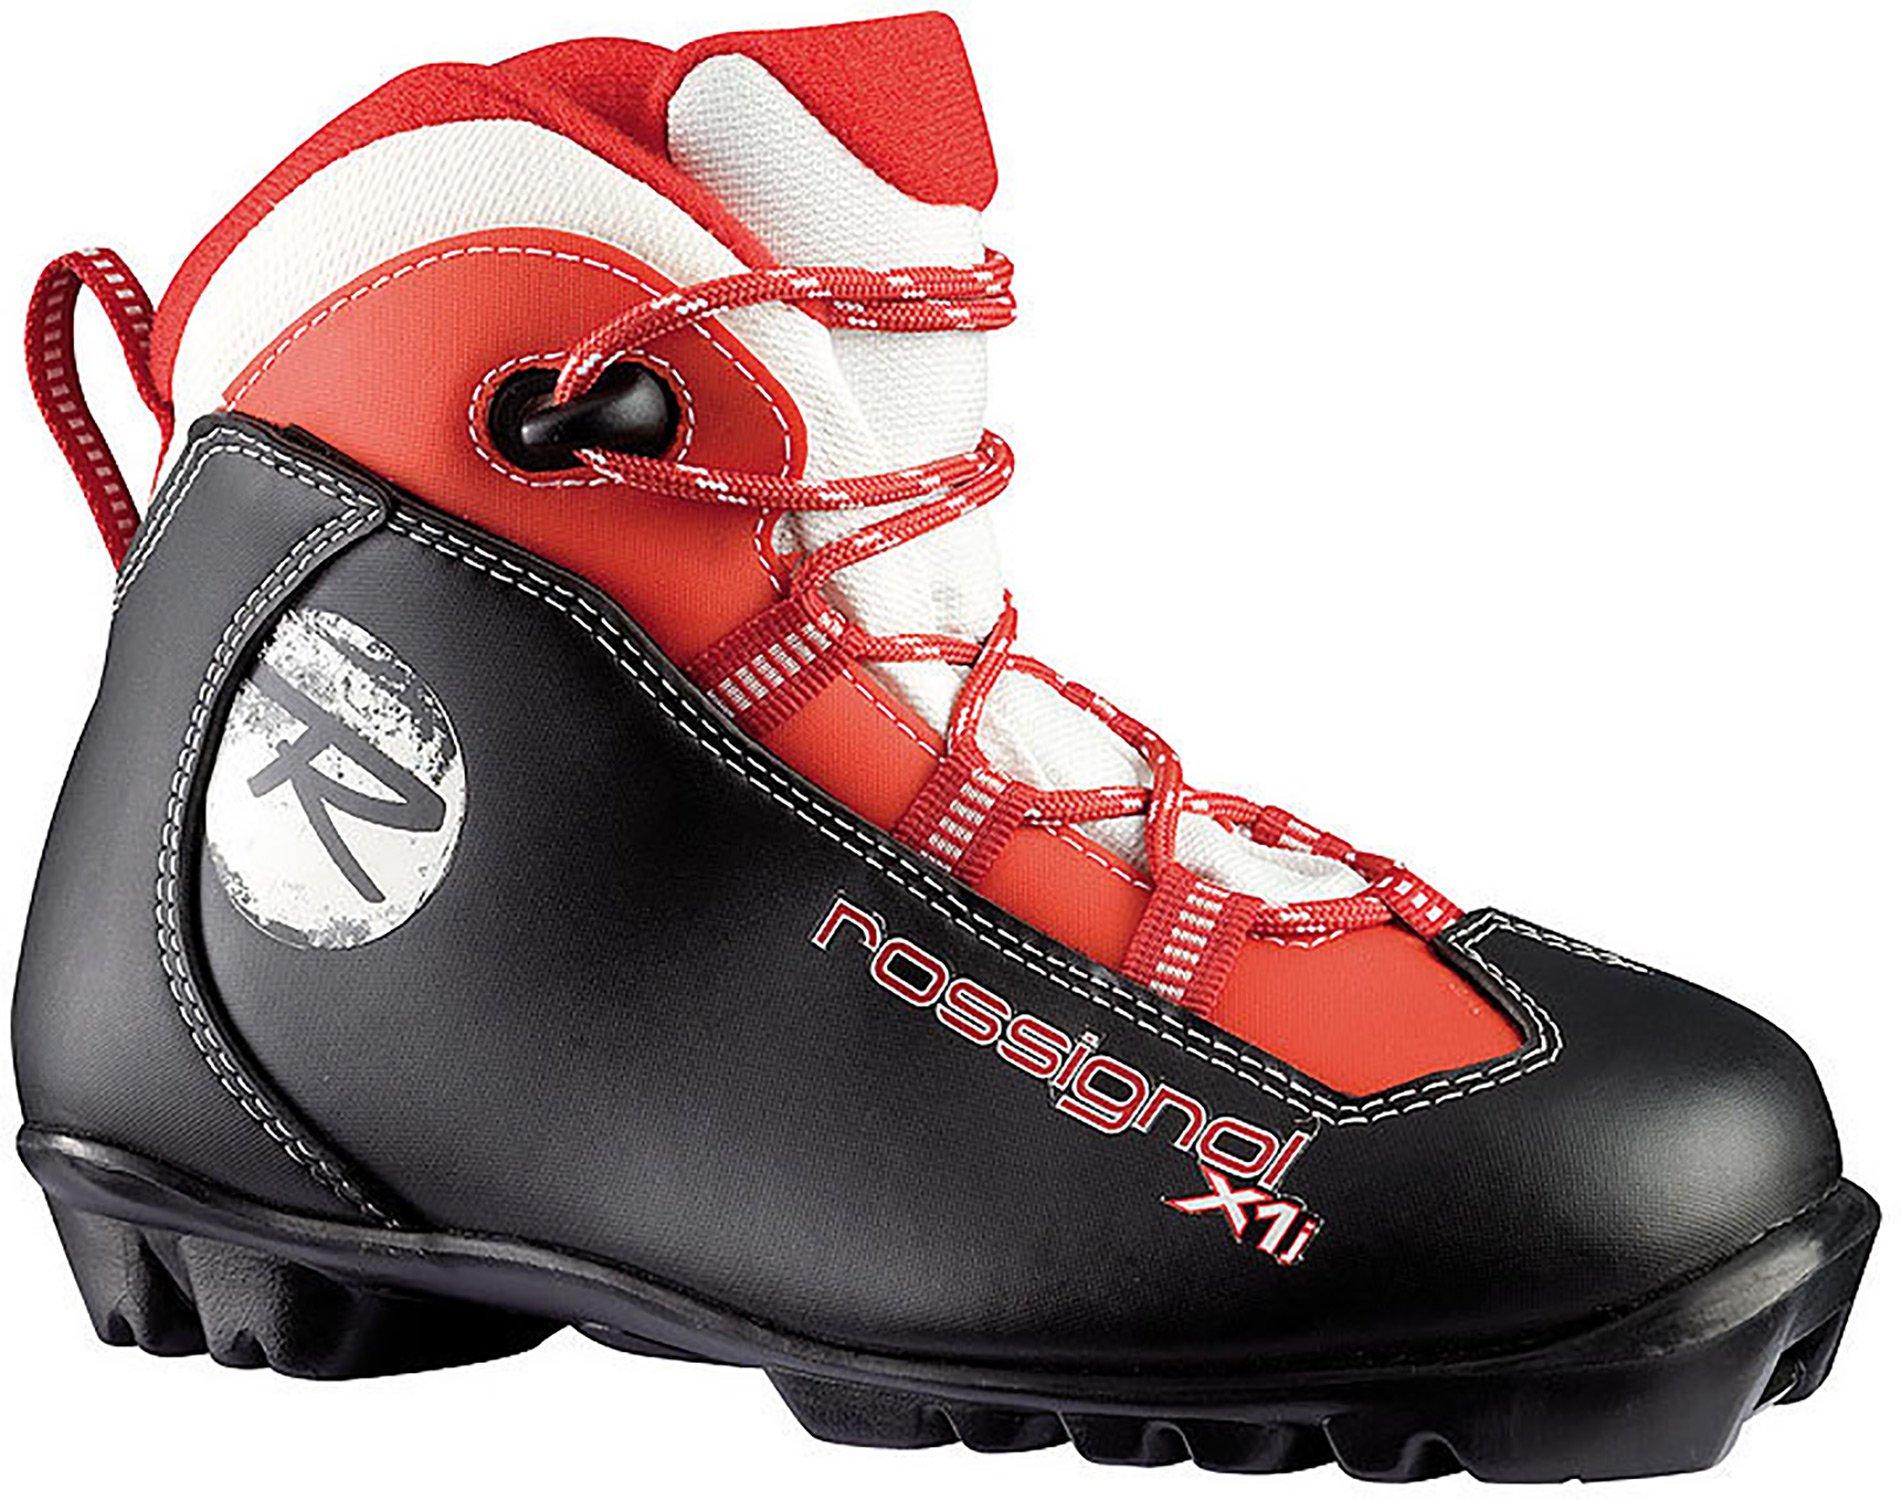 Rossignol X-1 Jr XC Ski Boots Sz 6.5 Kids by Rossignol